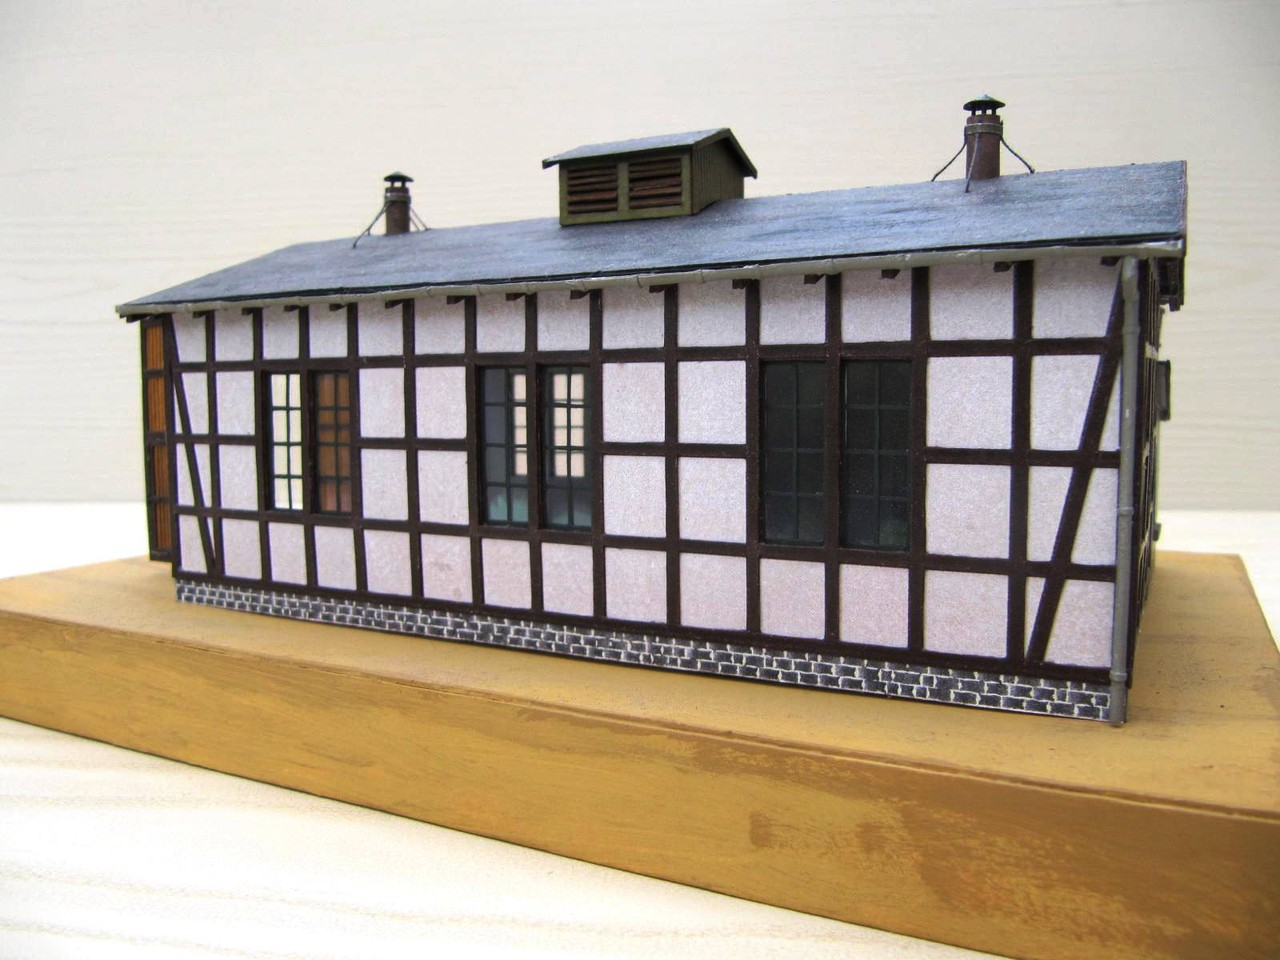 (c) W. Fehse - Fenster 1:87 (H0)